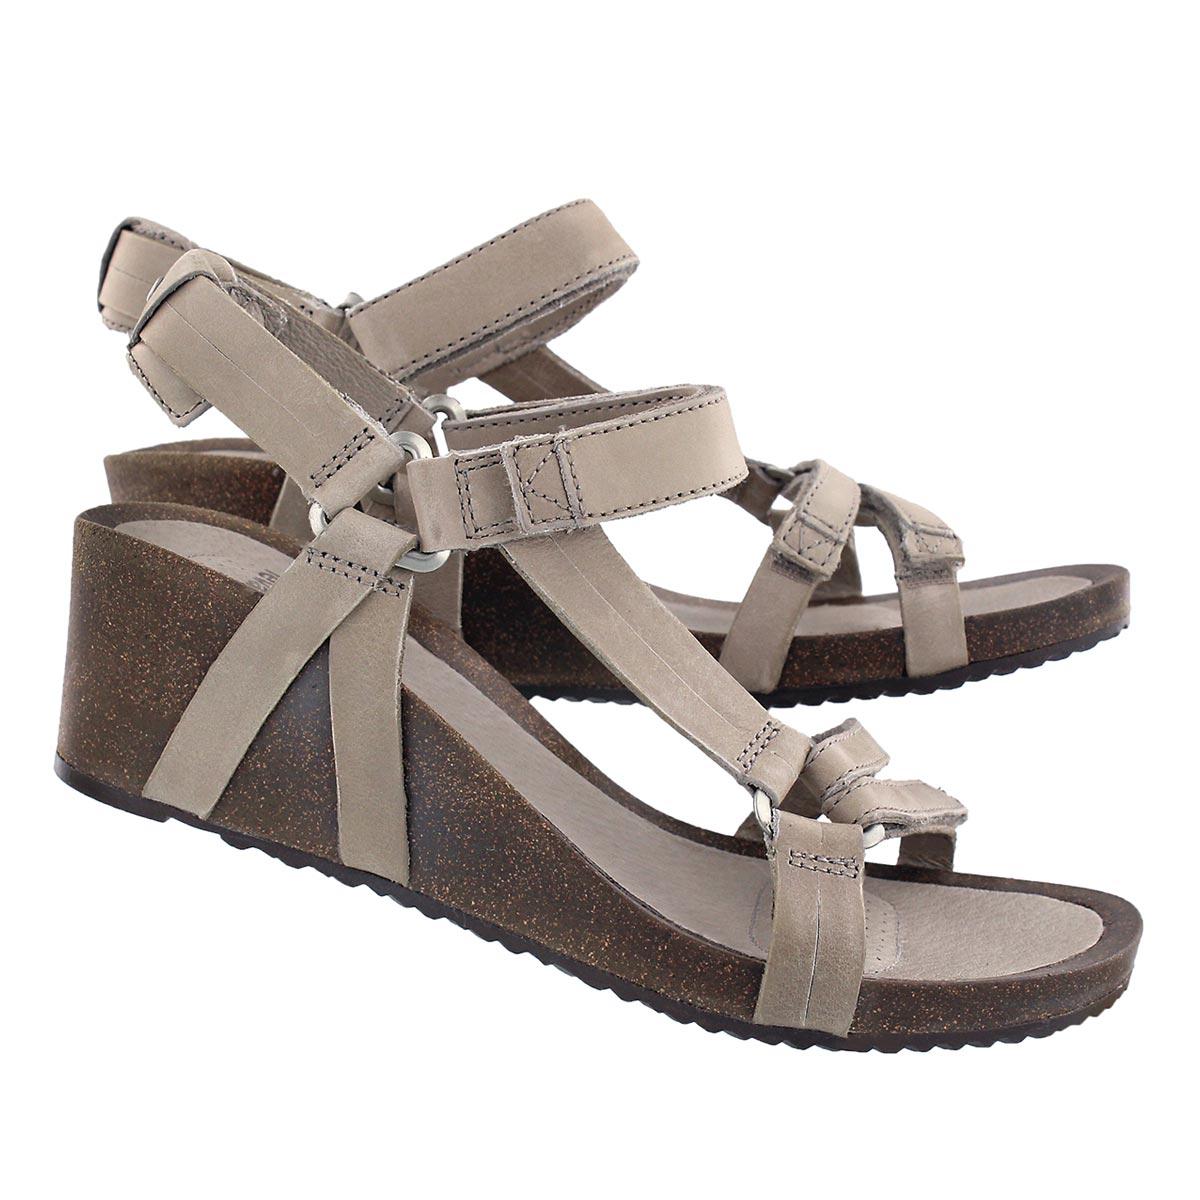 Lds Ysidro Universal taupe wedge sandal